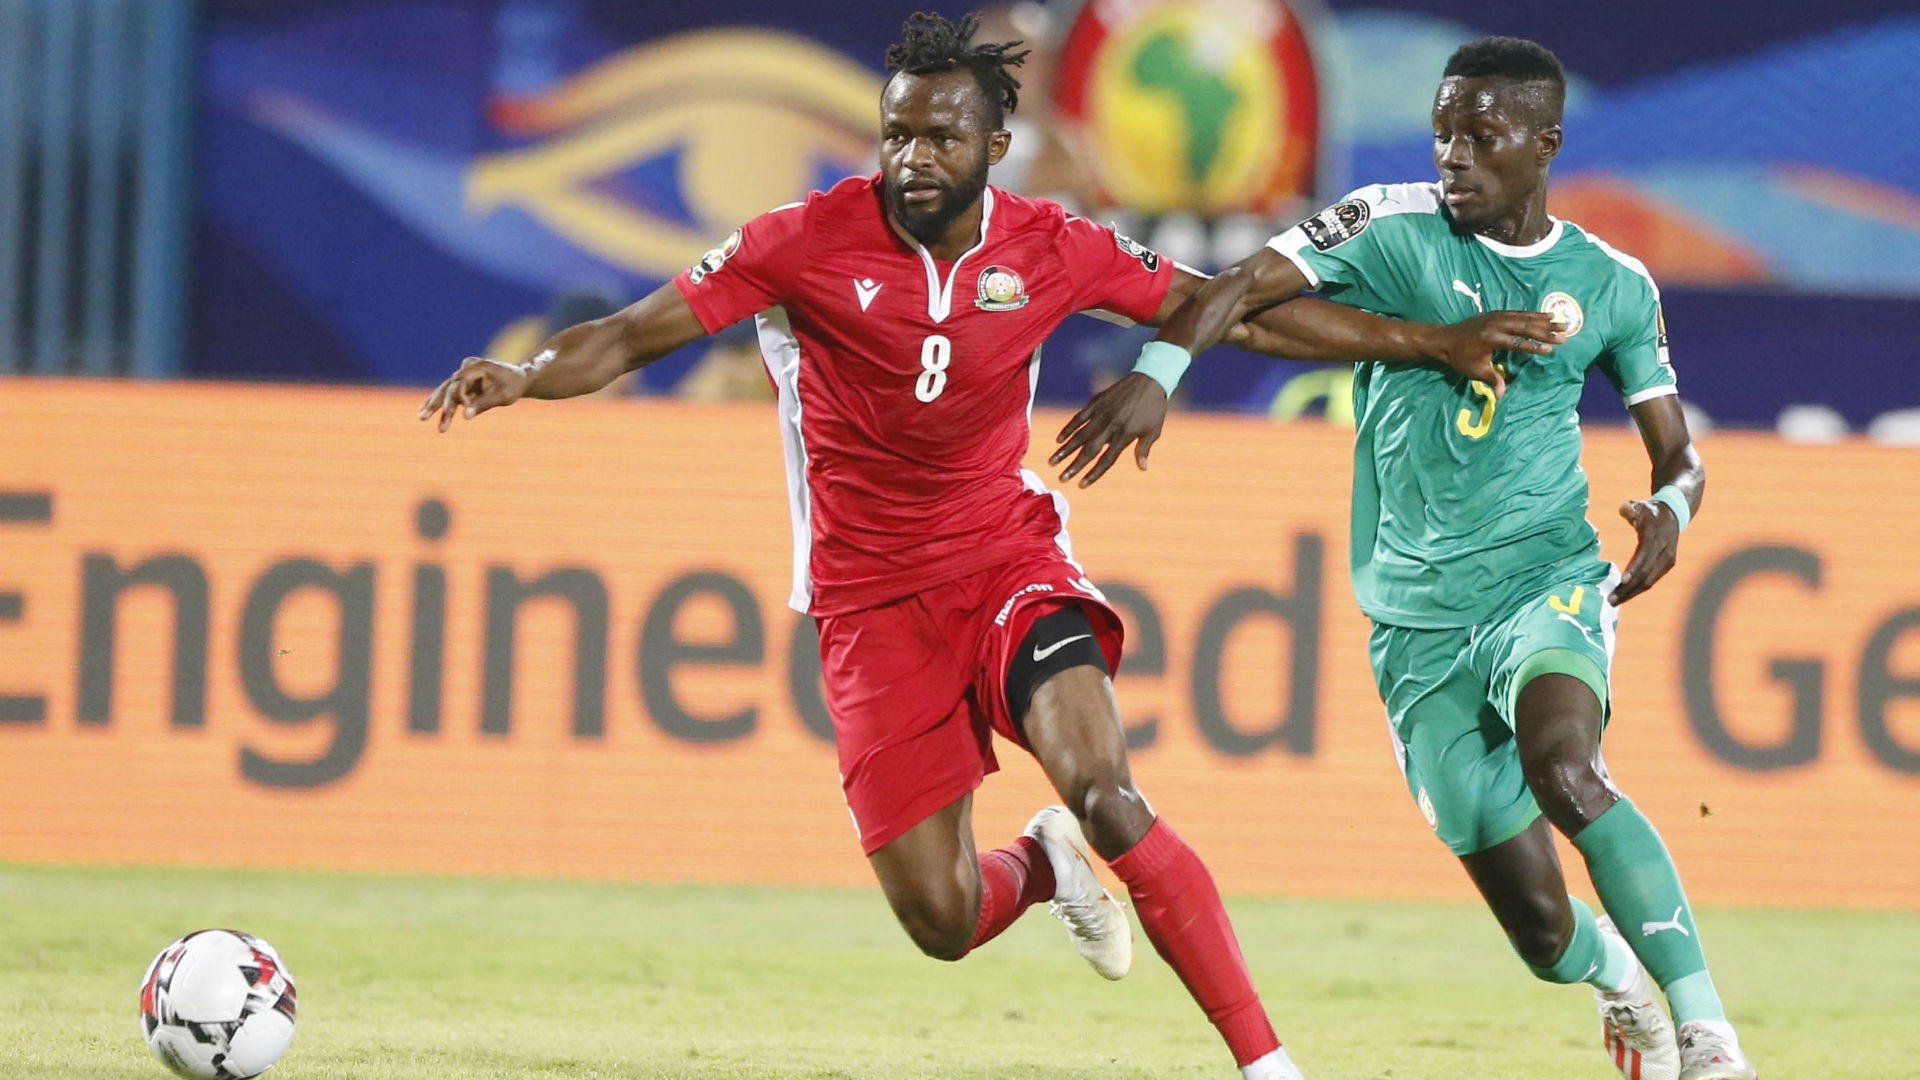 Omolo: Harambee Stars midfielder proposes to girlfriend in Paris